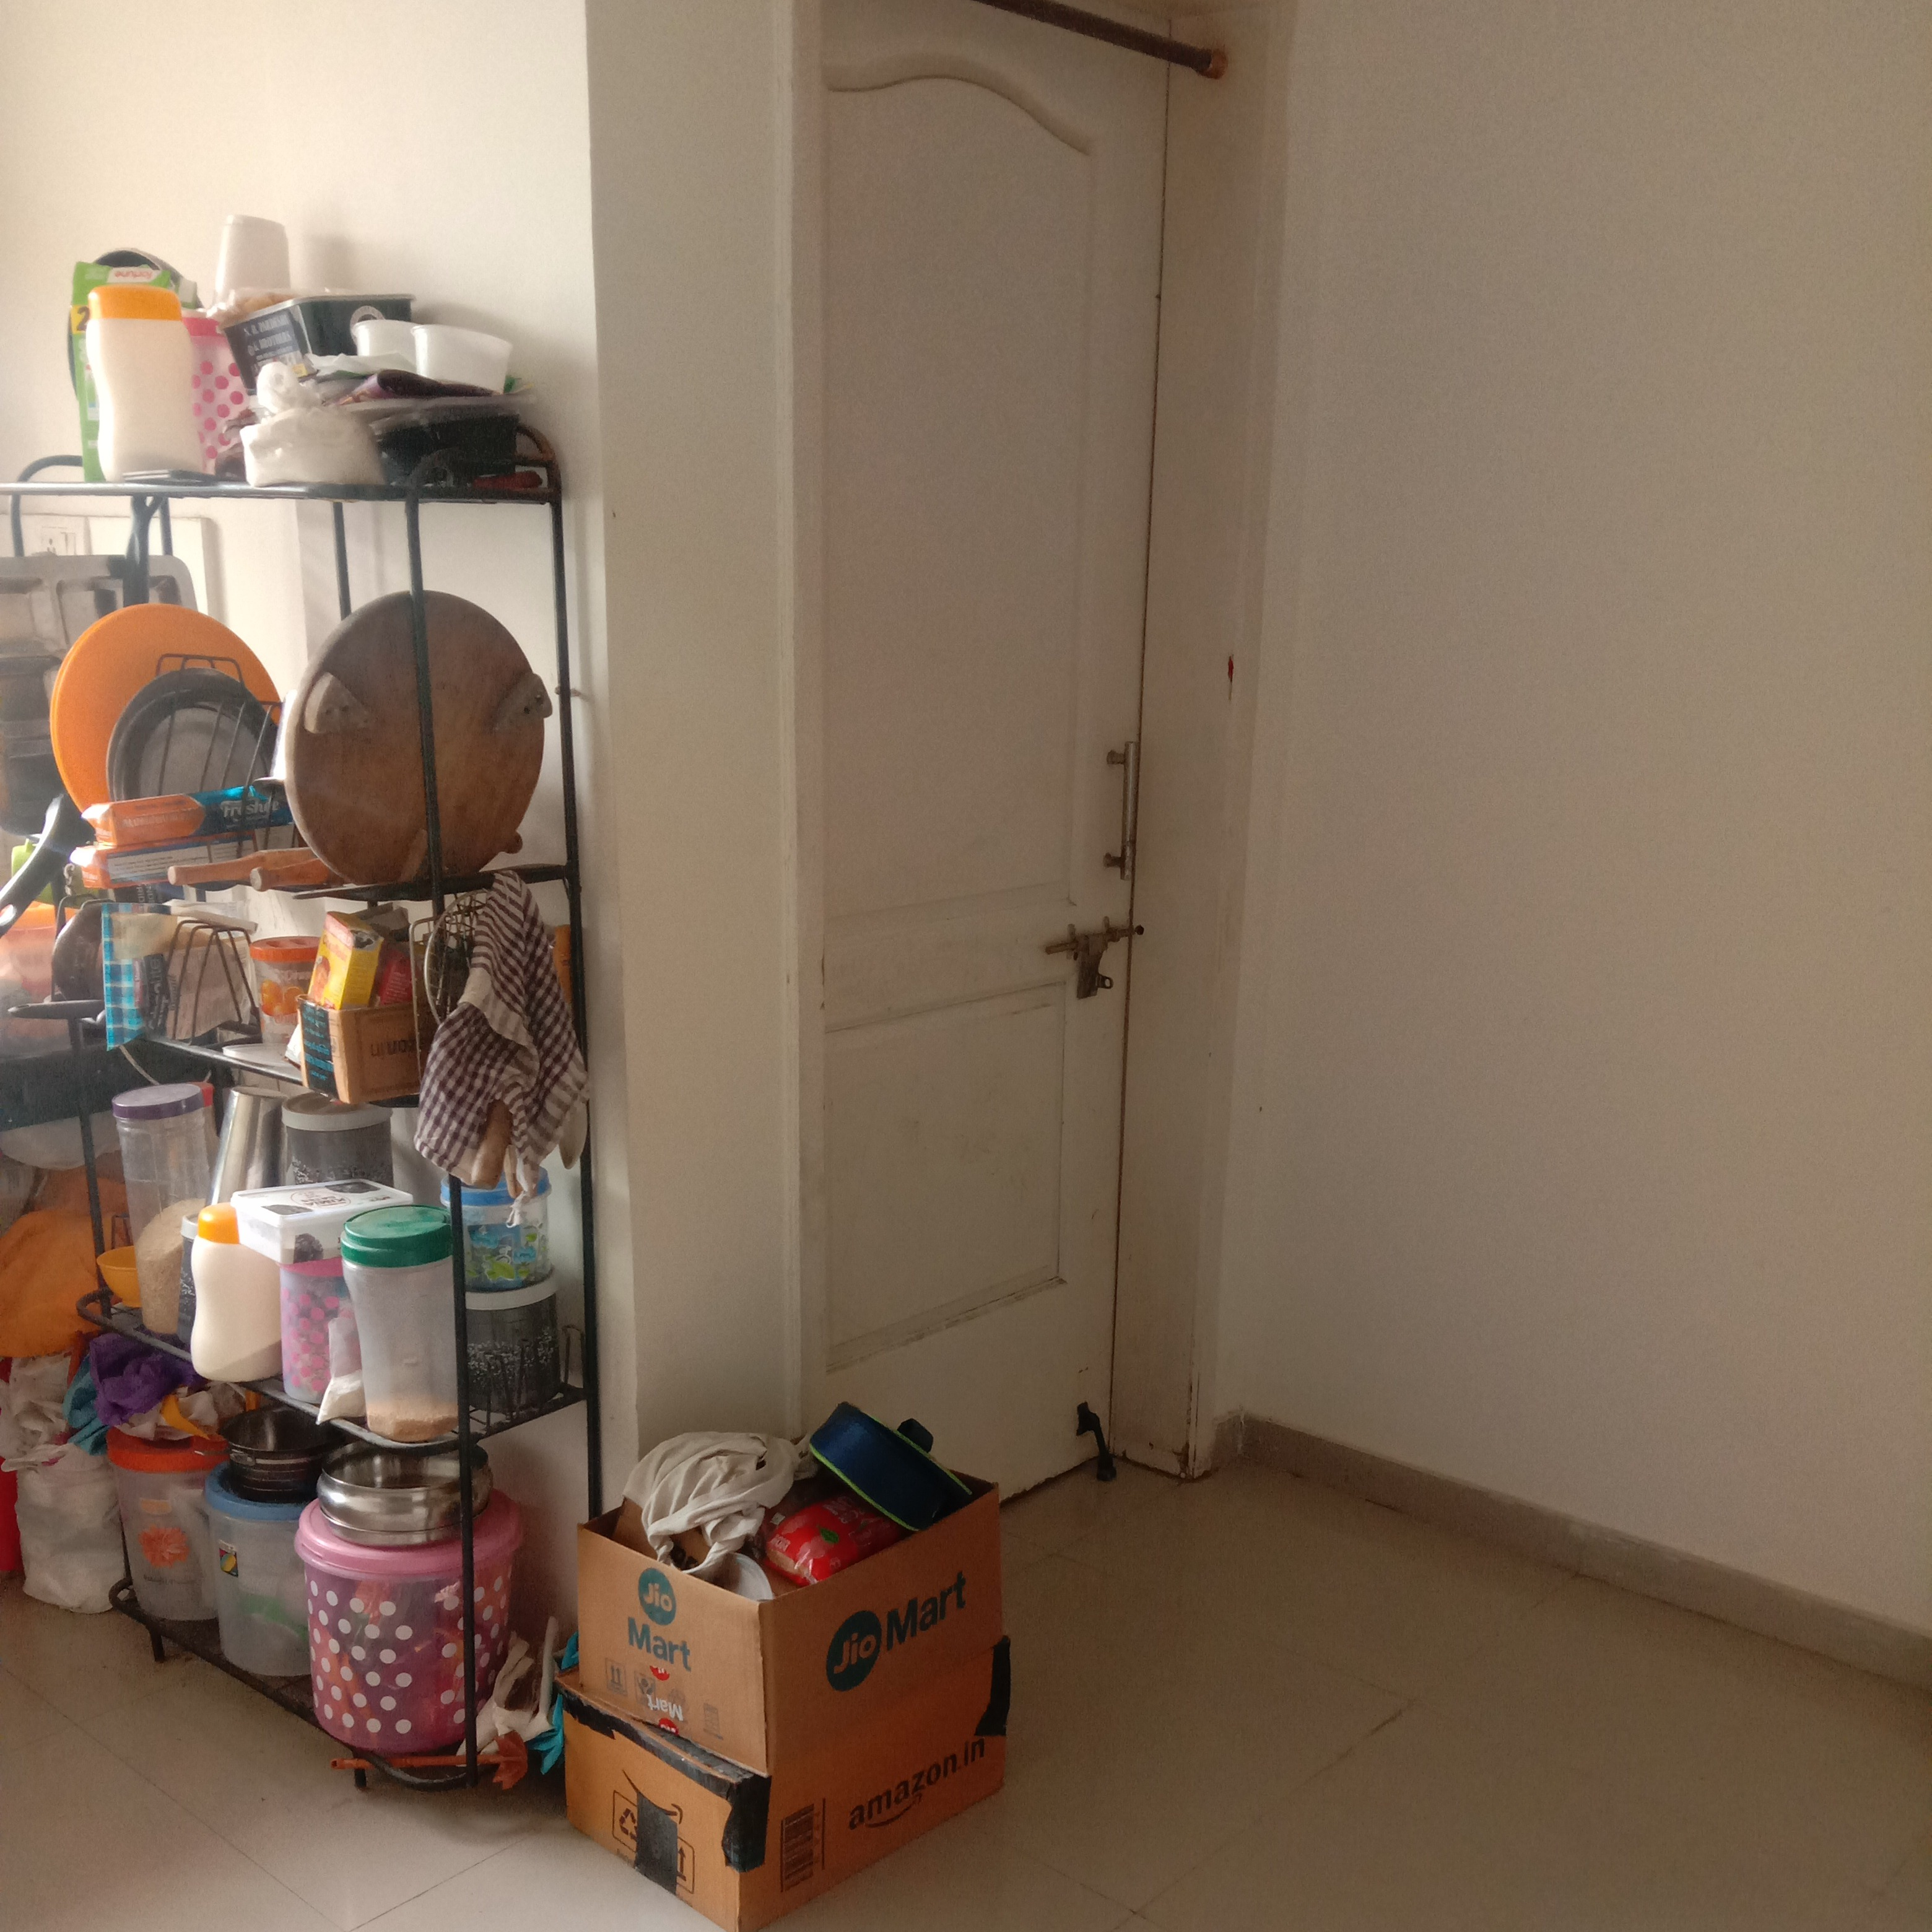 living-room-Picture-kothari-tingre-the-village-2289696